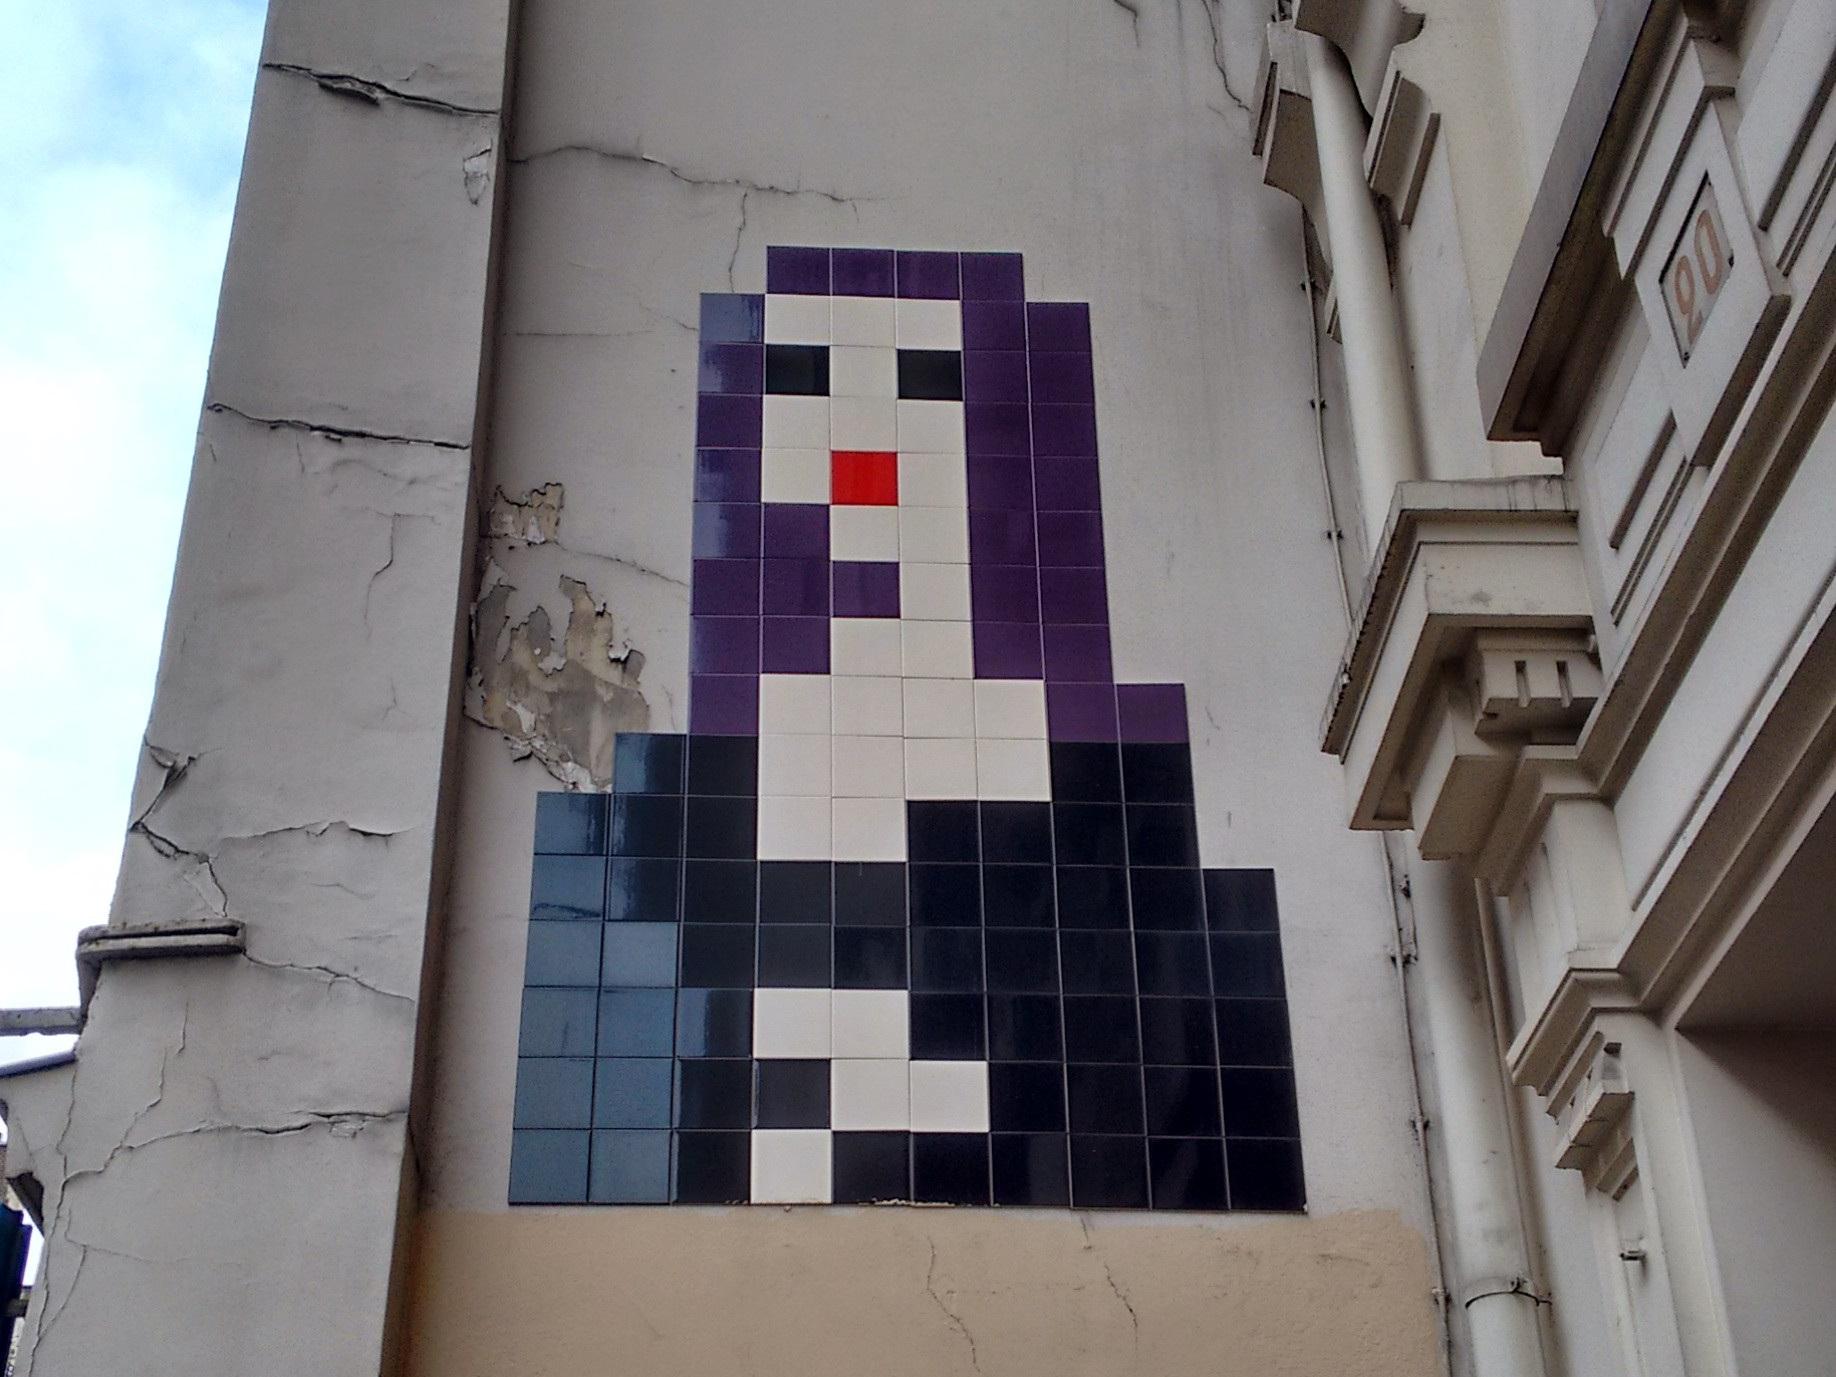 The 8-bit Mona Lisa